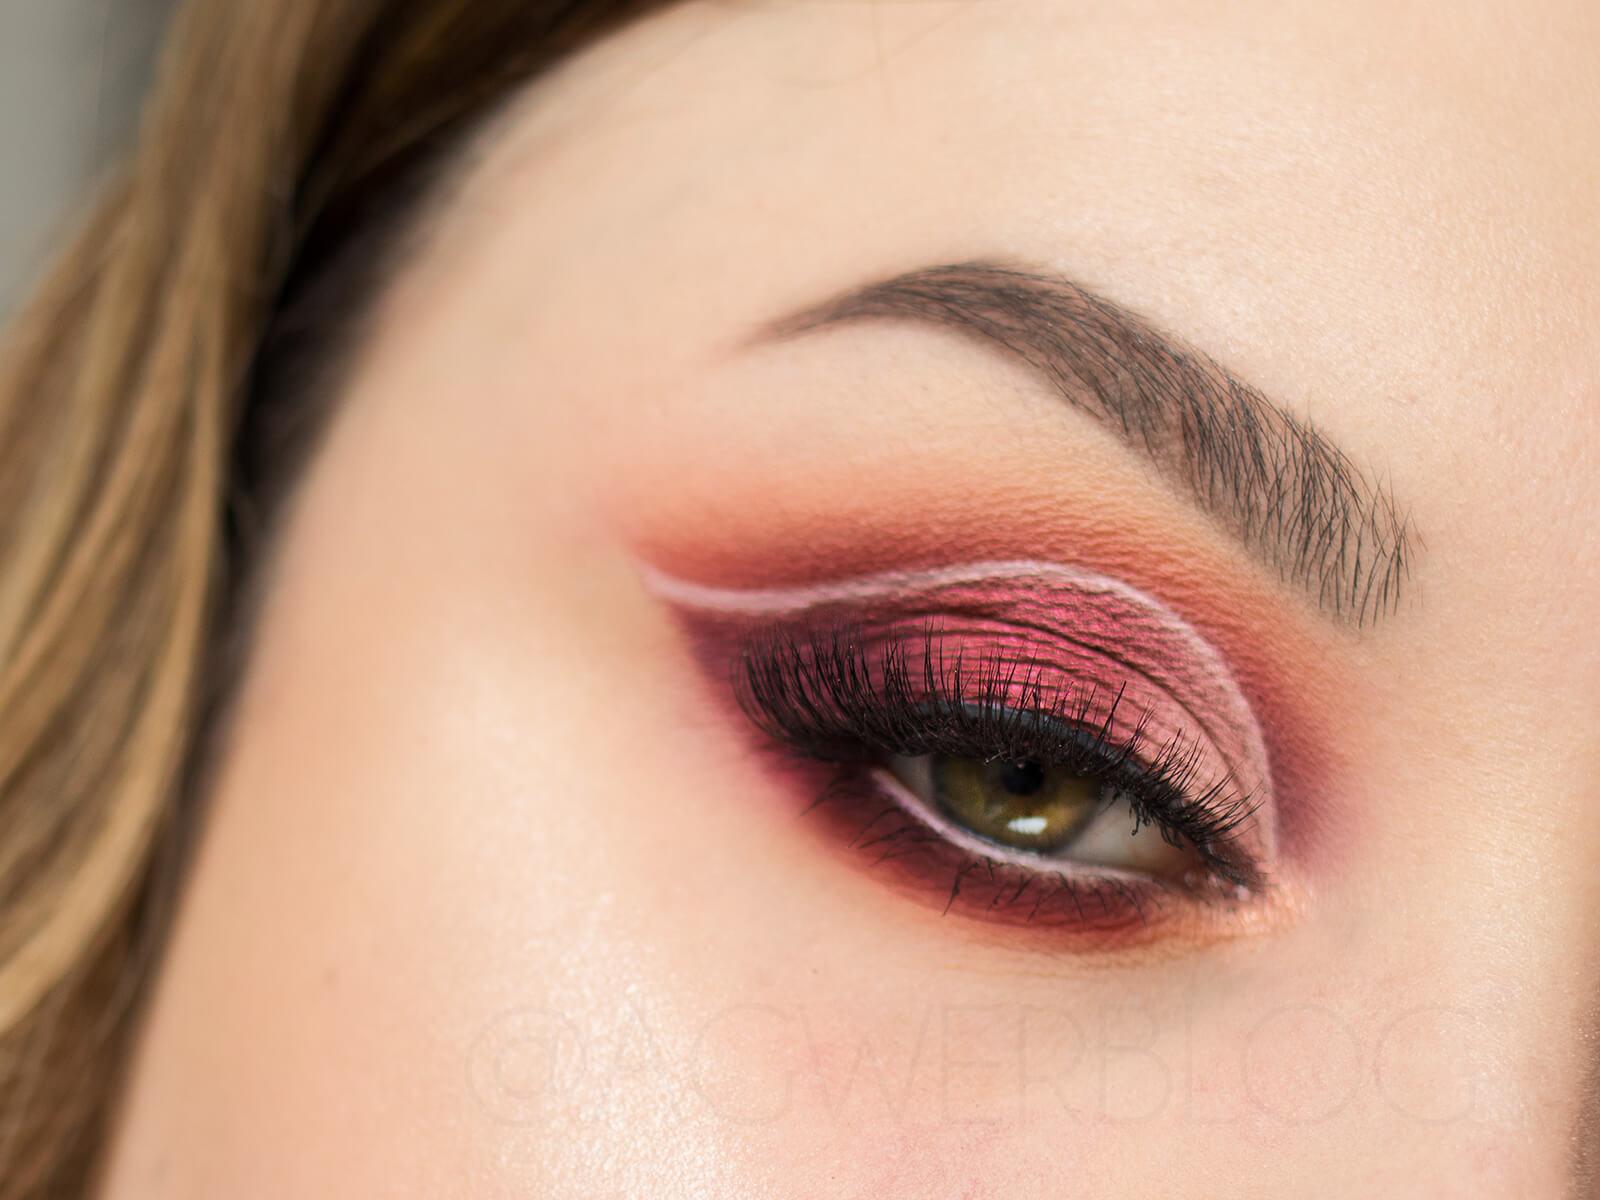 KKW Beauty Classic Blossom makeup inspiration